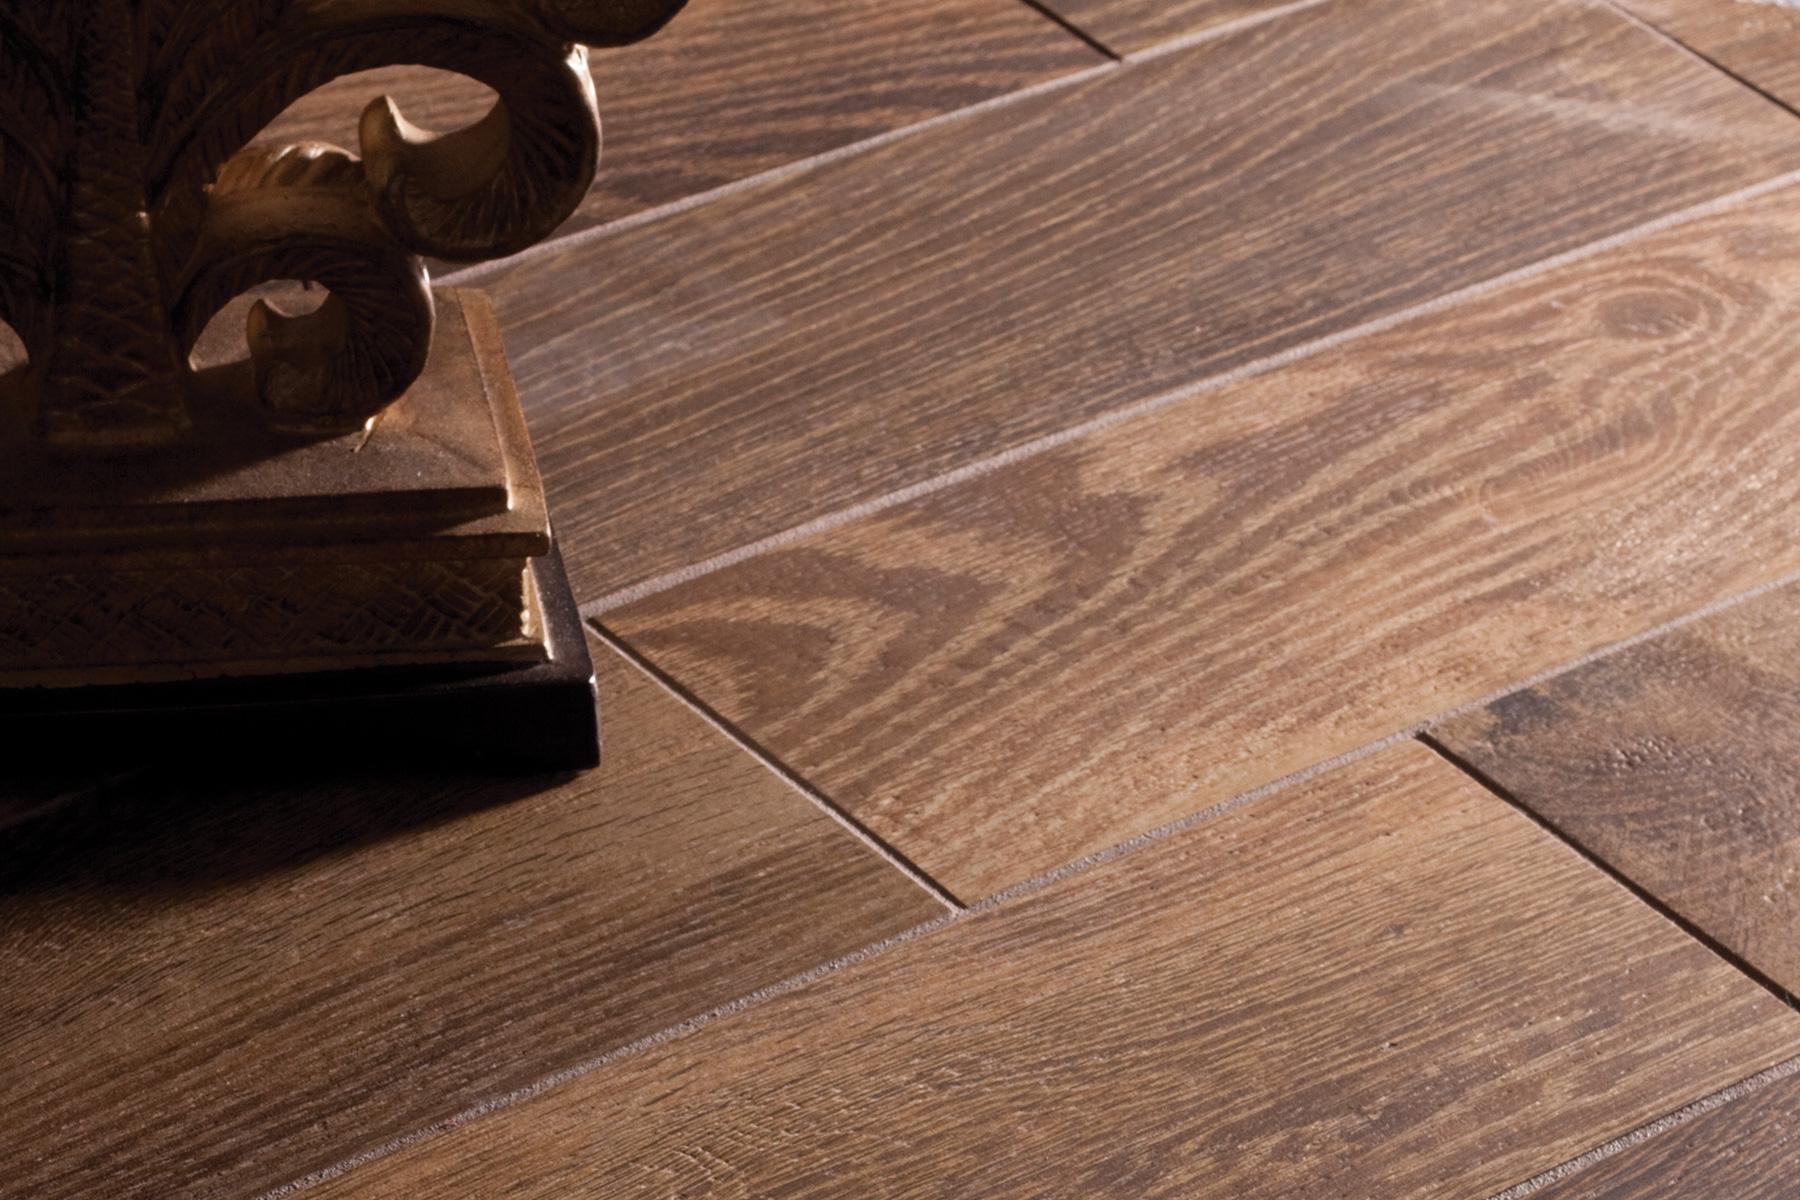 Lifestyles for American Naturals Rain Barrel- Lint Tile